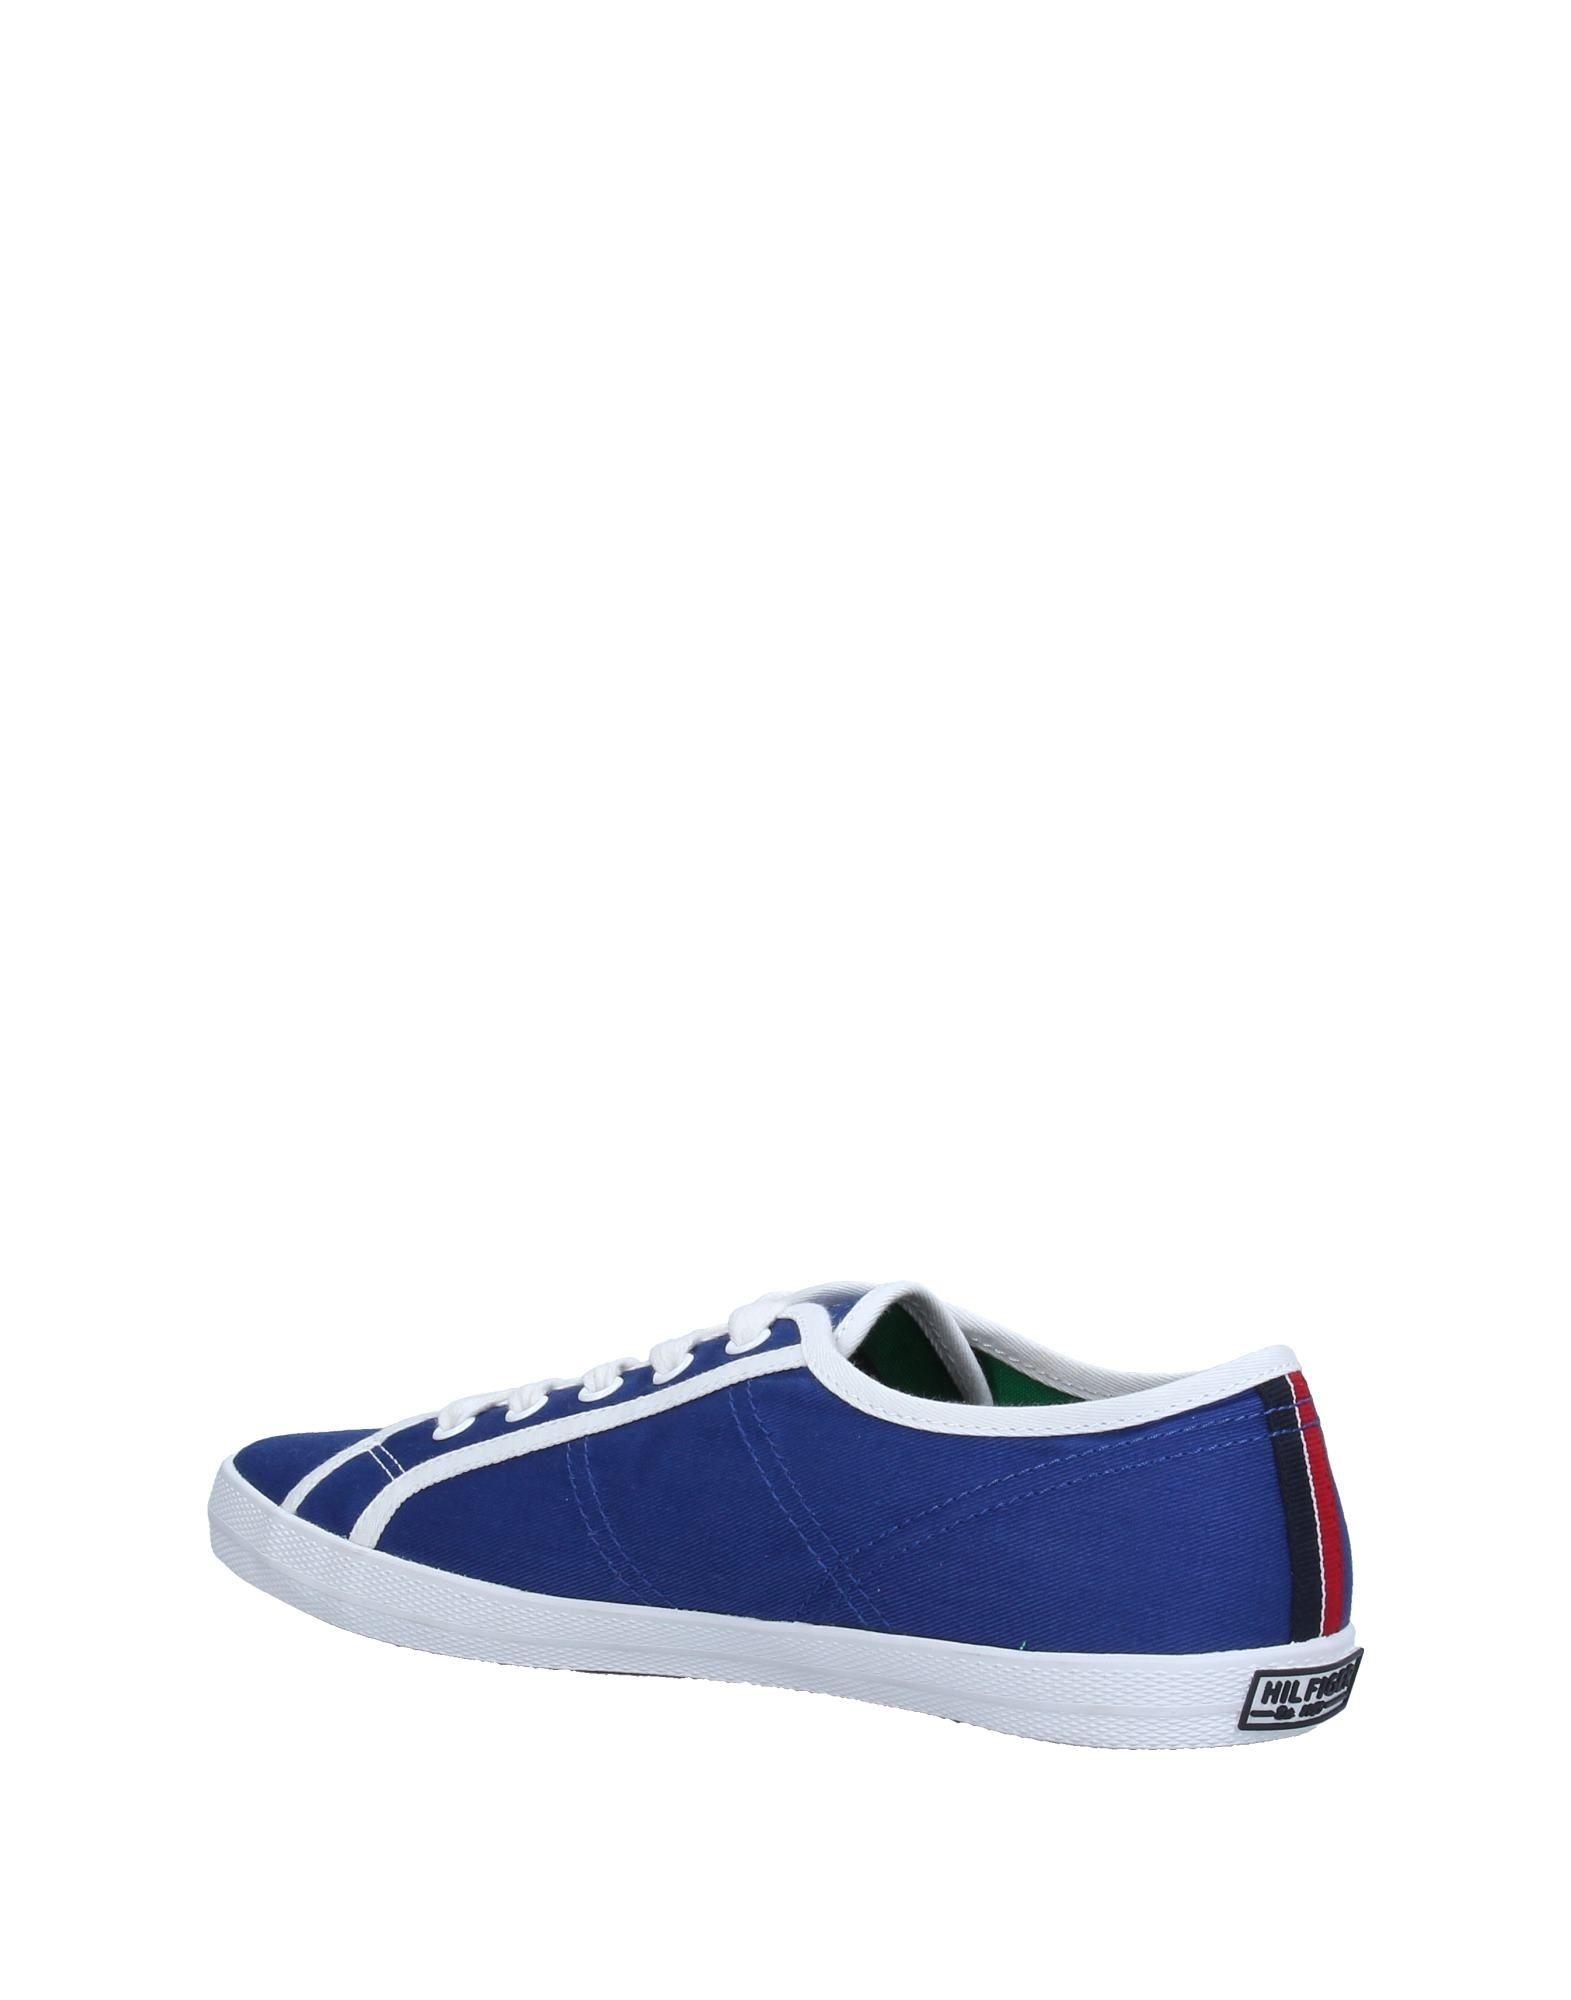 Tommy Hilfiger Sneakers Damen  Schuhe 11261116BV Neue Schuhe  331e5f